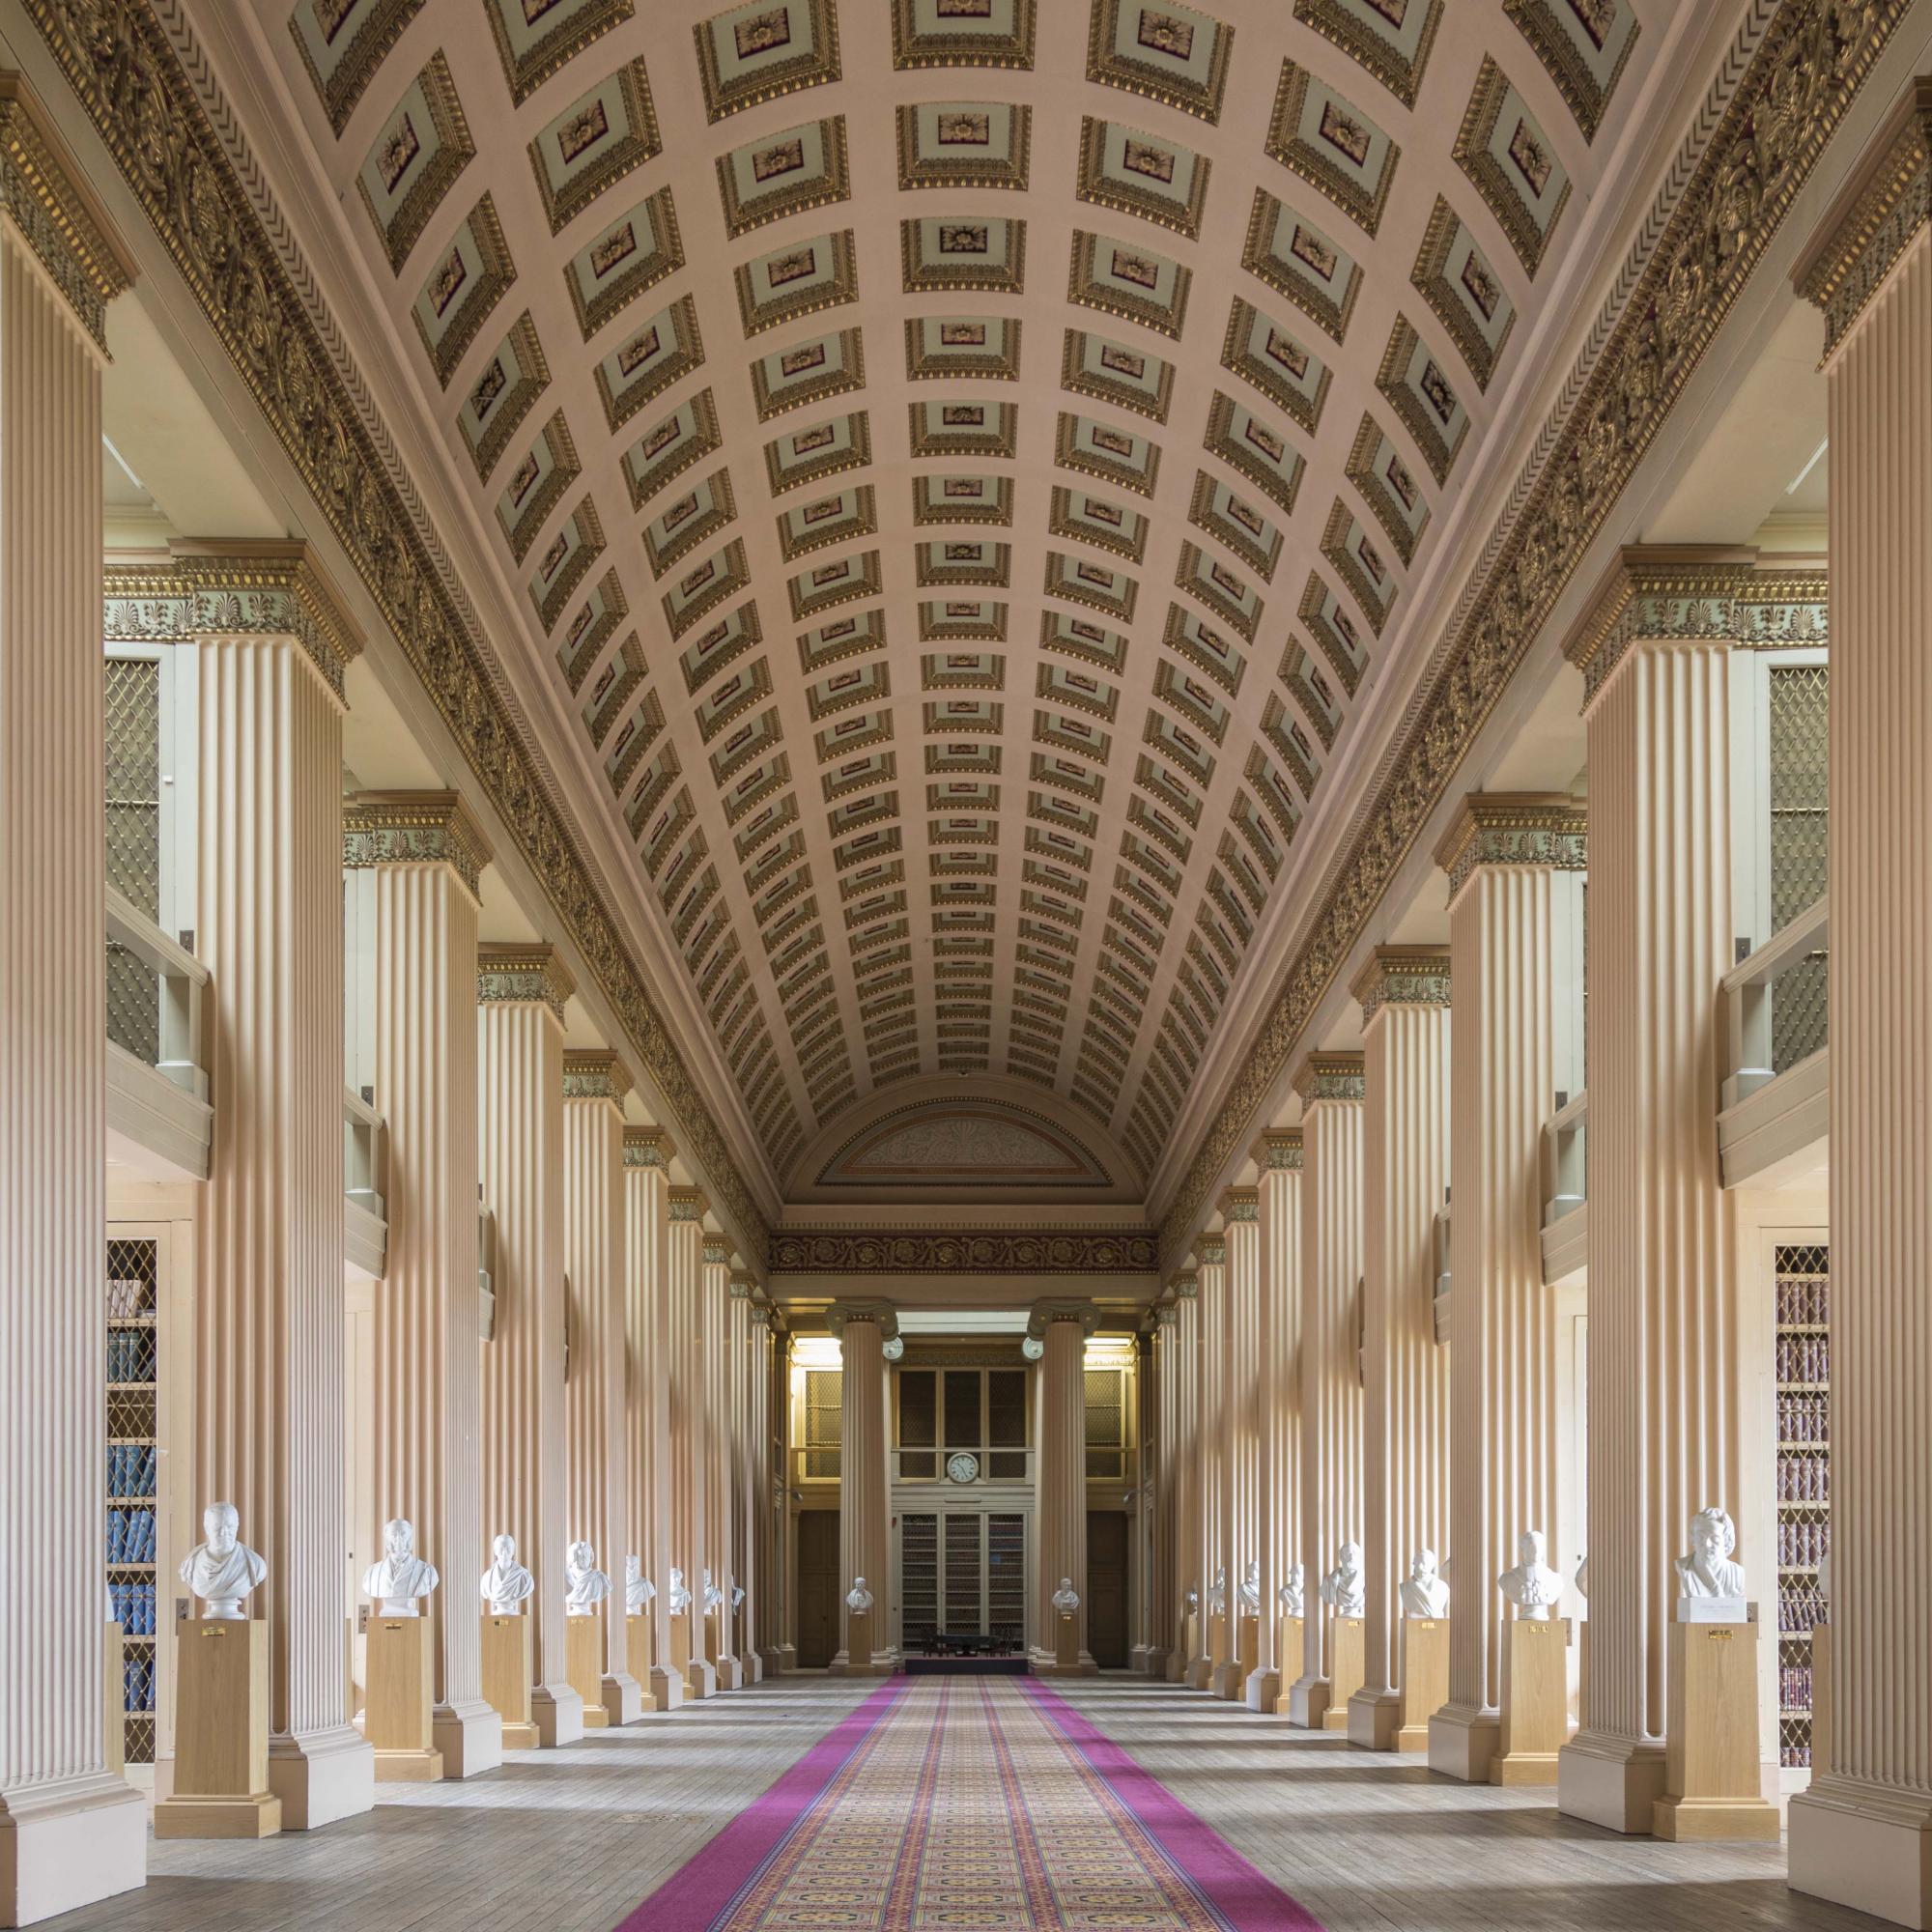 Pleasant History Of Edinburgh University National Galleries Of Scotland Home Interior And Landscaping Ponolsignezvosmurscom